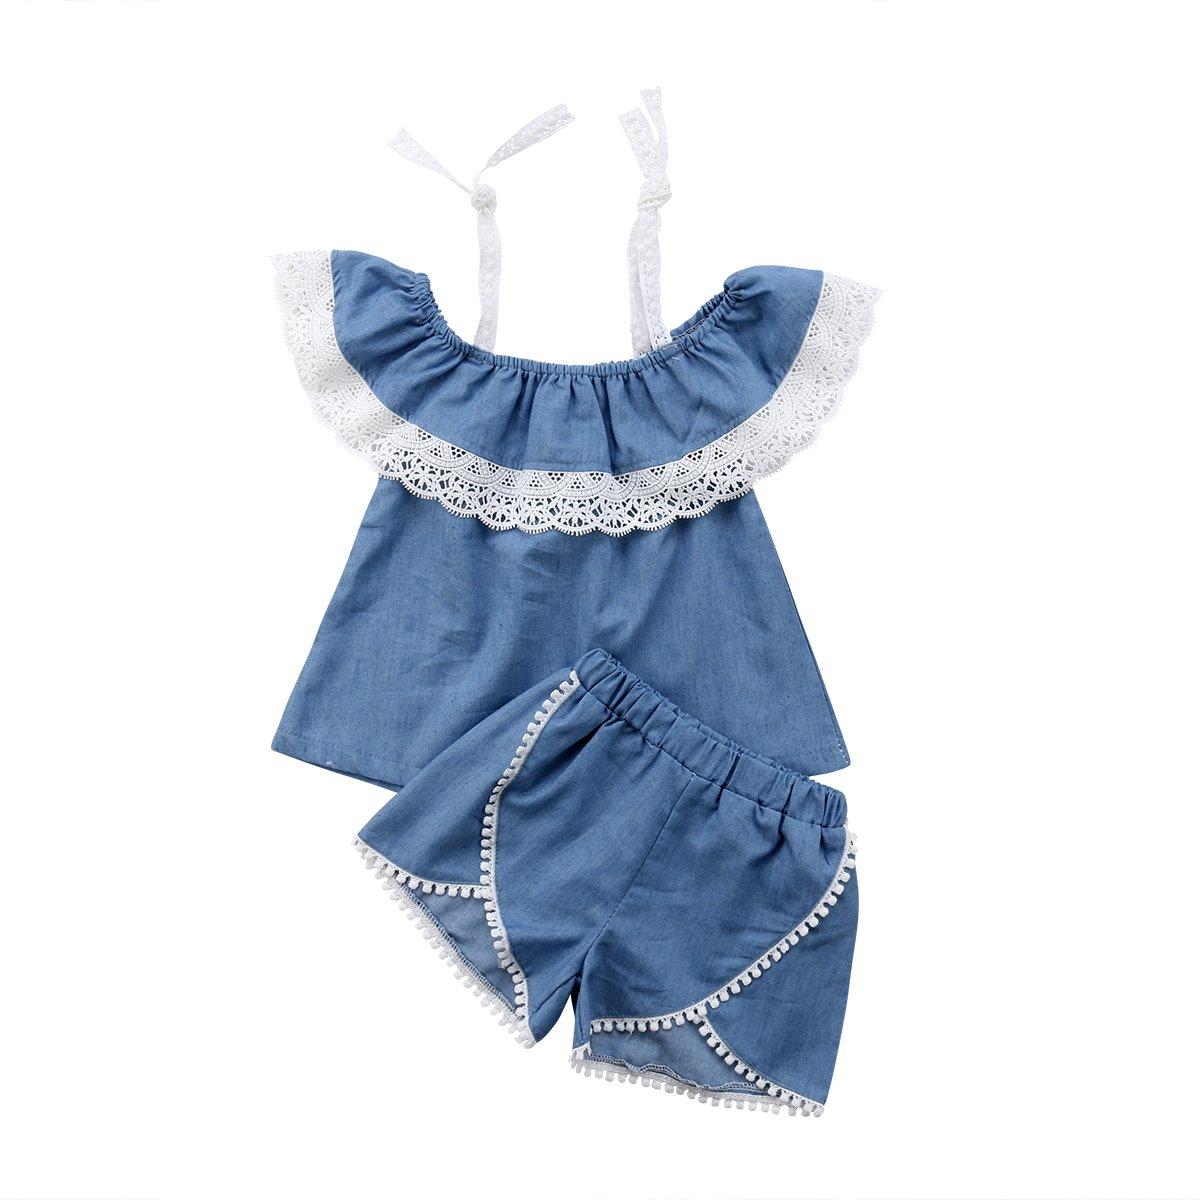 Toddler Little Girl Demin Off Shoulder Ruffle Pocket Romper Jumpsuit Clothes Set (Blue(lace), 3-4T) by Mubineo